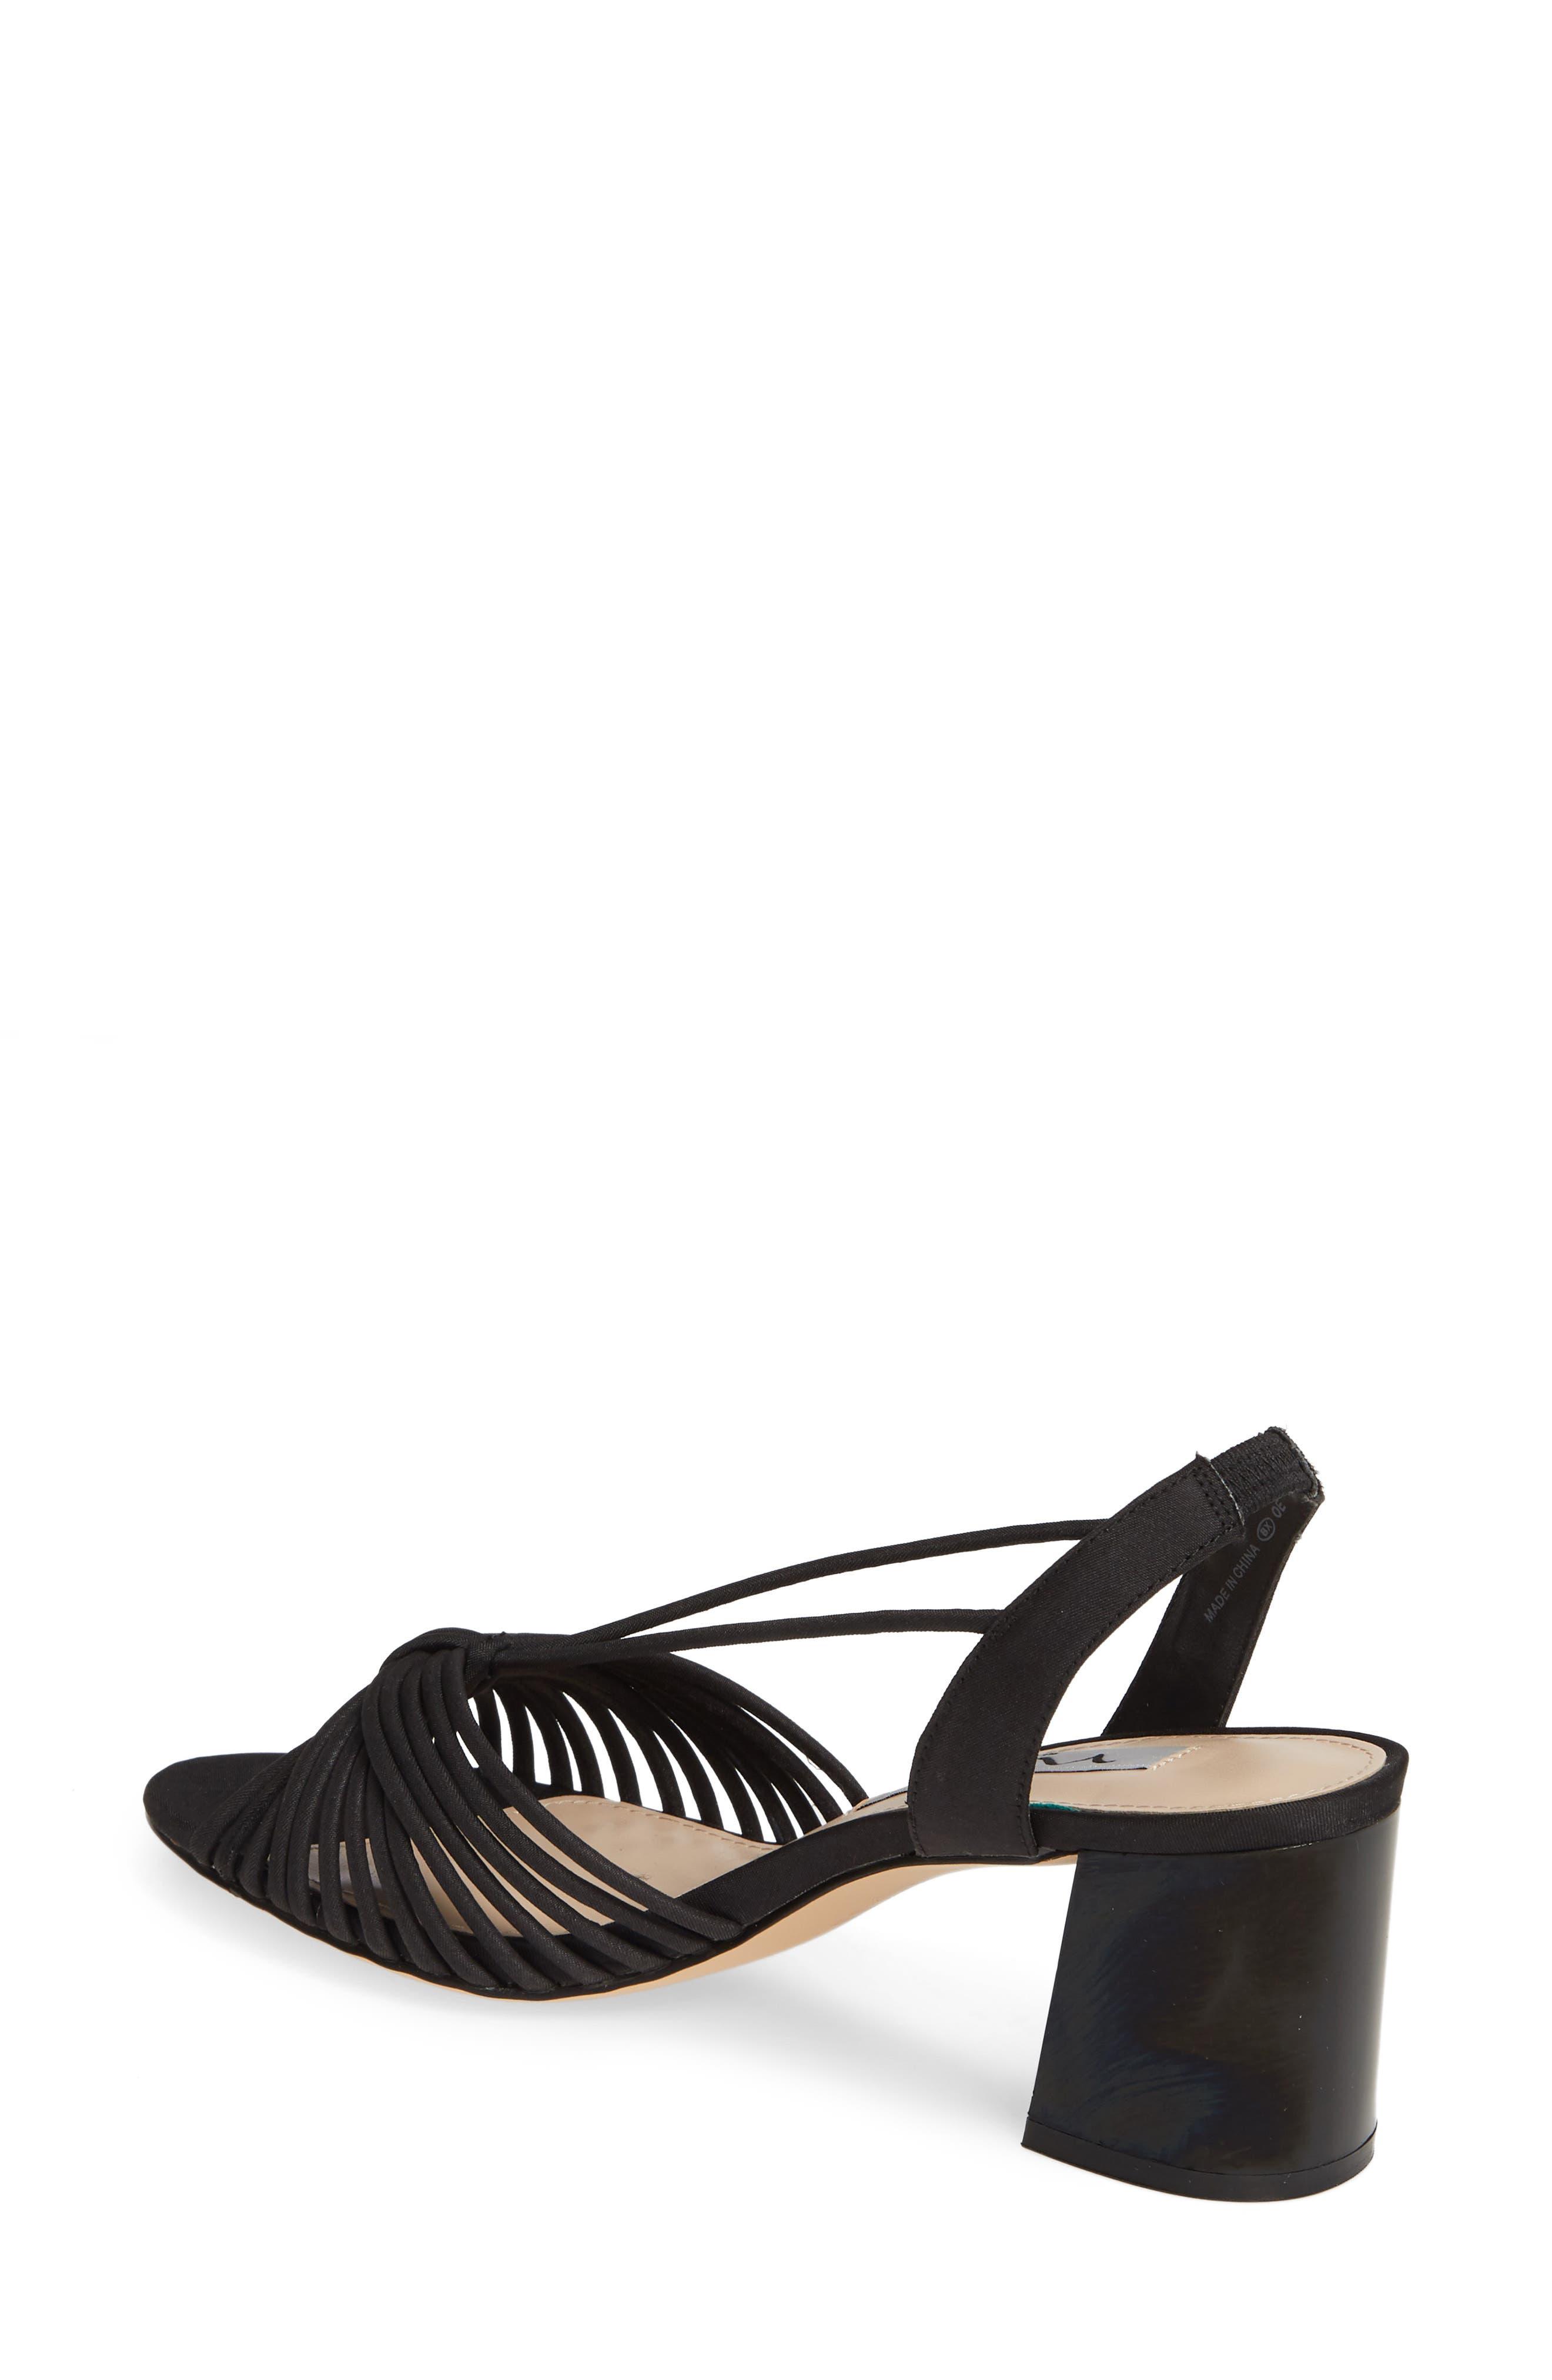 NINA, Nadelyn Strappy Sandal, Alternate thumbnail 2, color, BLACK FABRIC